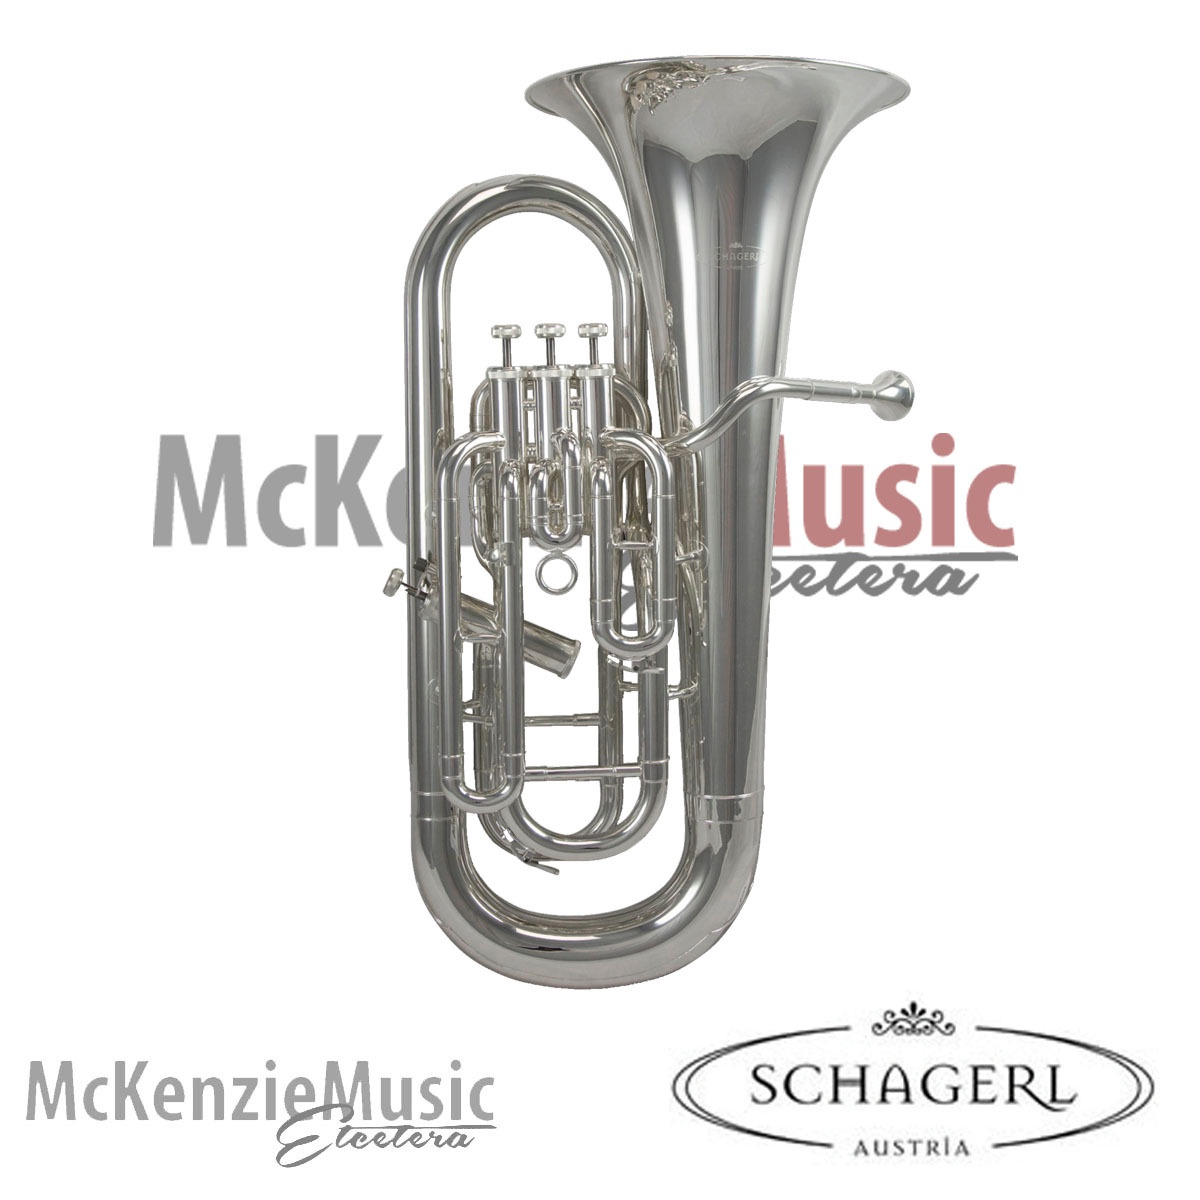 Schagerl SLEP900S Euphonium